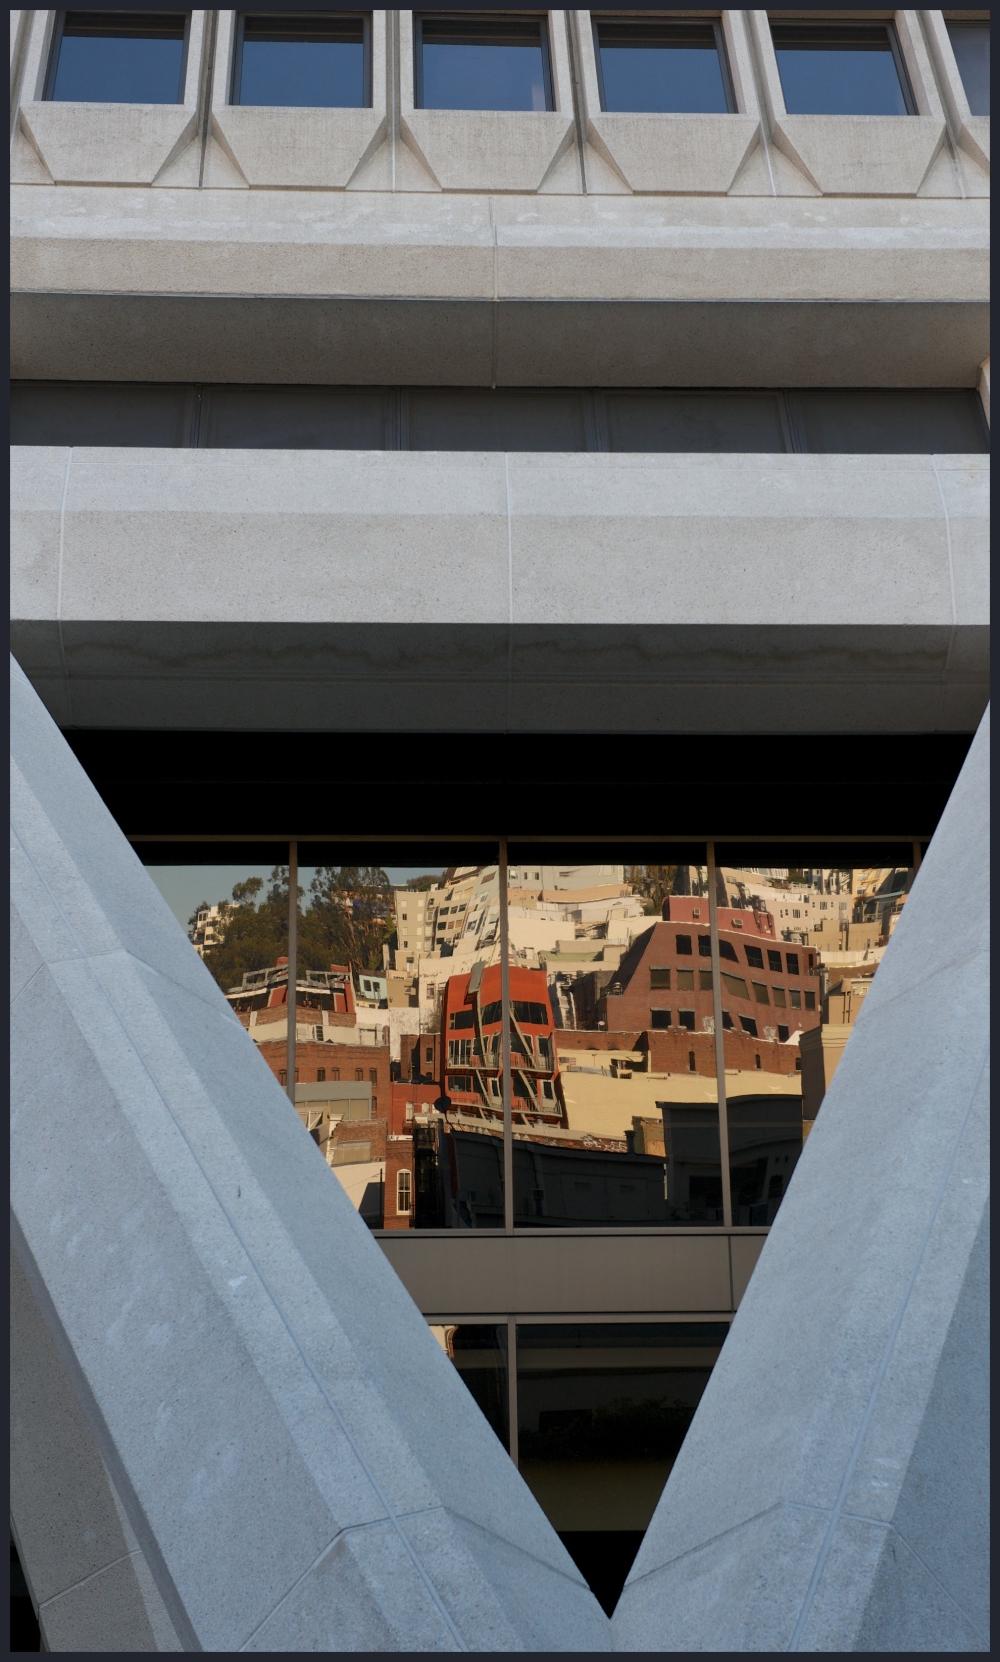 TransAmerican Pyramid San Francisco CA window